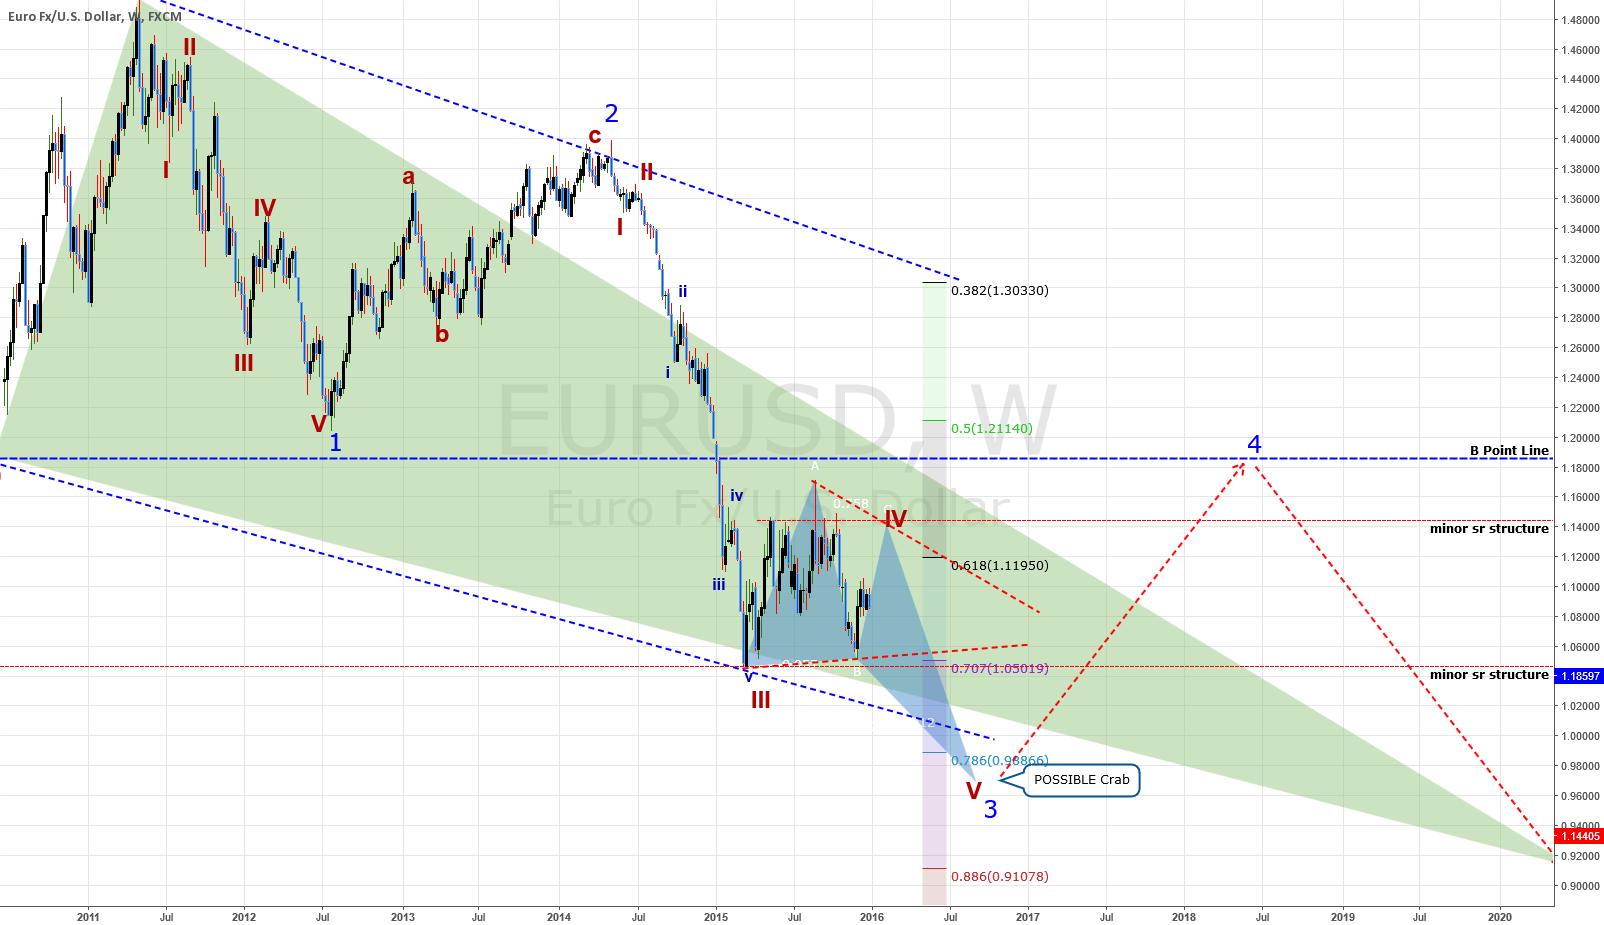 WEEKLY Chart: EURUSD: Bat Pattern Internal Wave Count